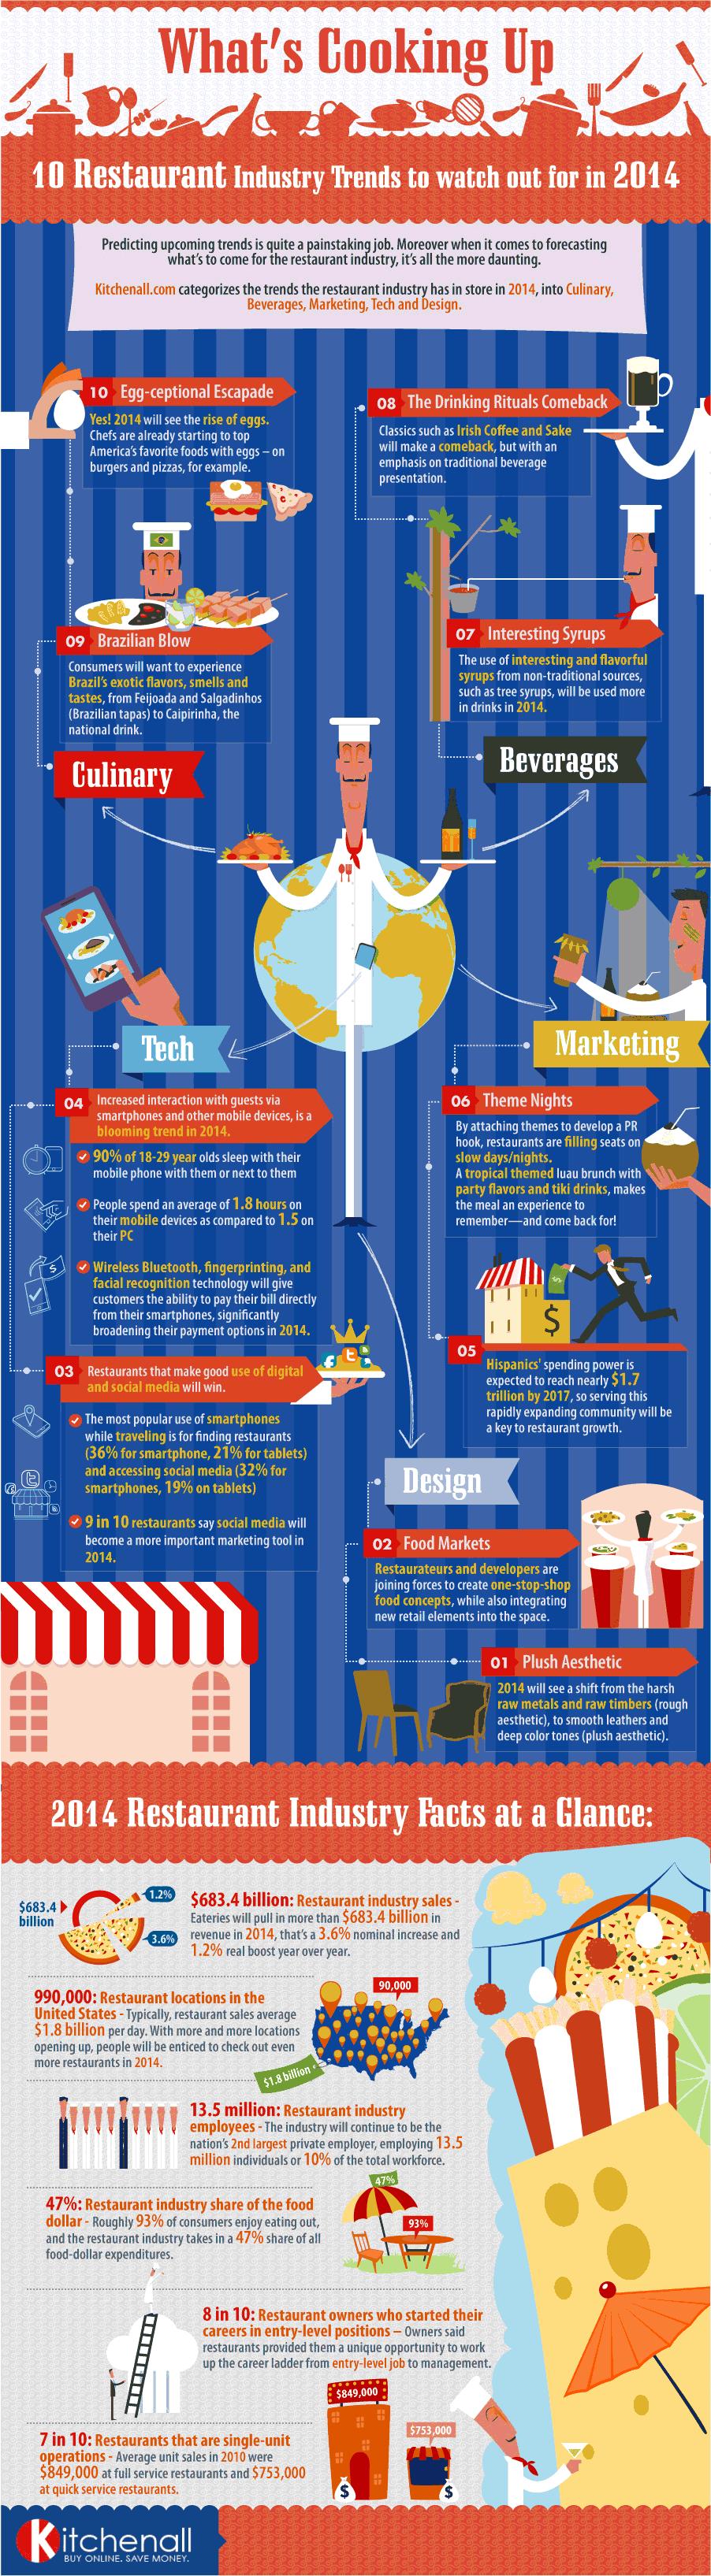 Restaurant Trends Infographic